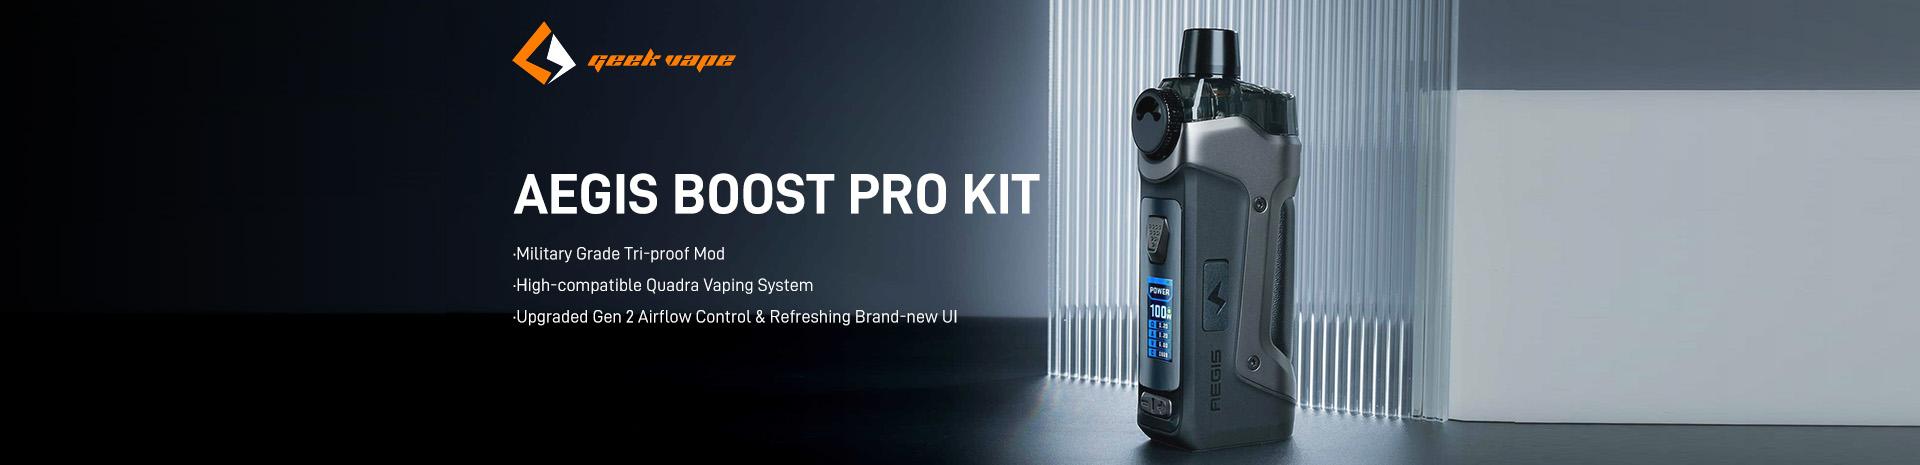 GeekVape Aegis Boost Pro Kit Banner